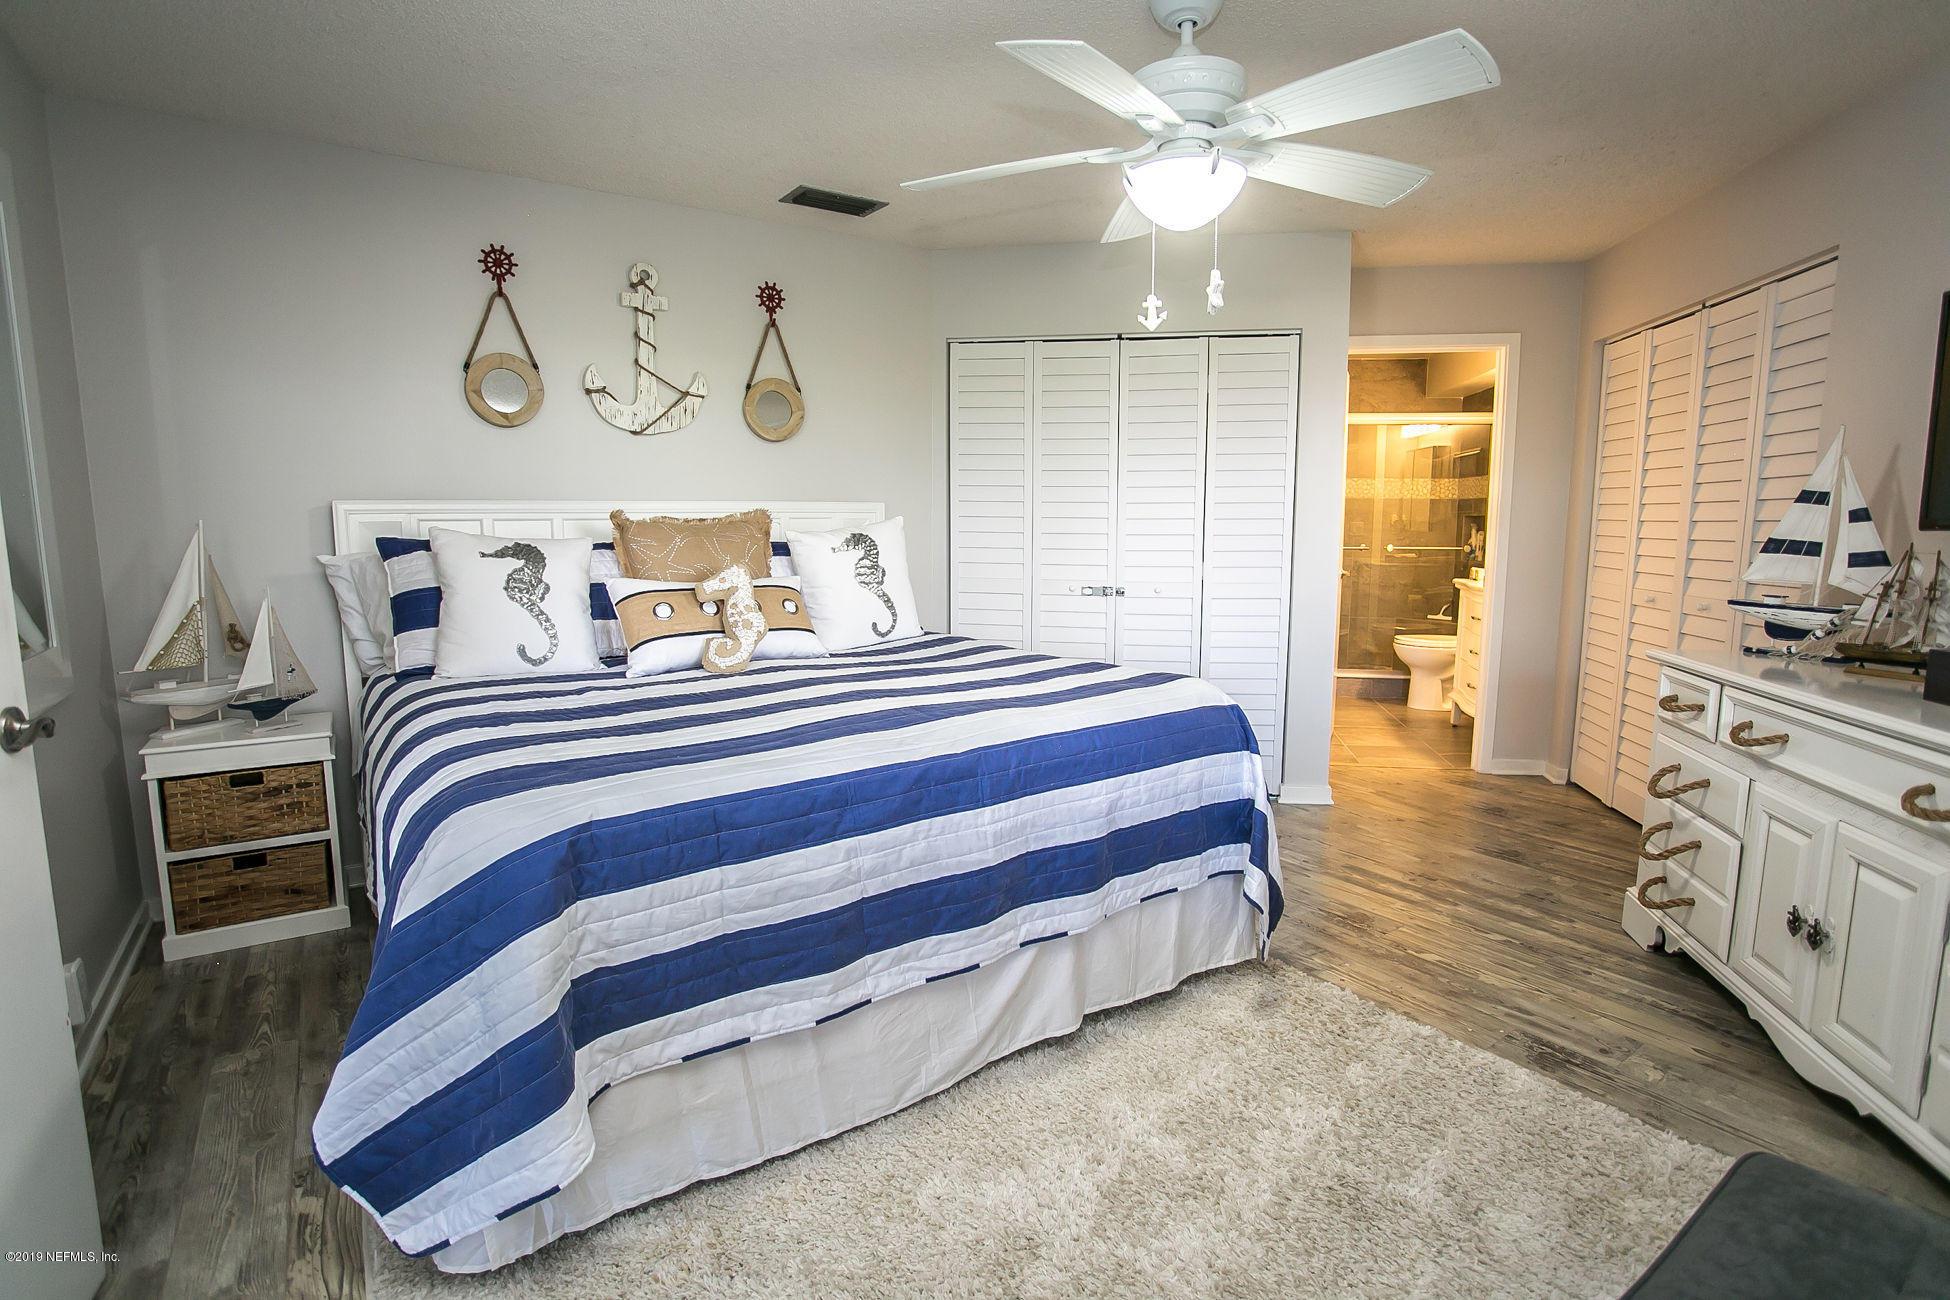 130 OCEAN HIBISCUS, ST AUGUSTINE, FLORIDA 32080, 2 Bedrooms Bedrooms, ,2 BathroomsBathrooms,Condo,For sale,OCEAN HIBISCUS,1010972